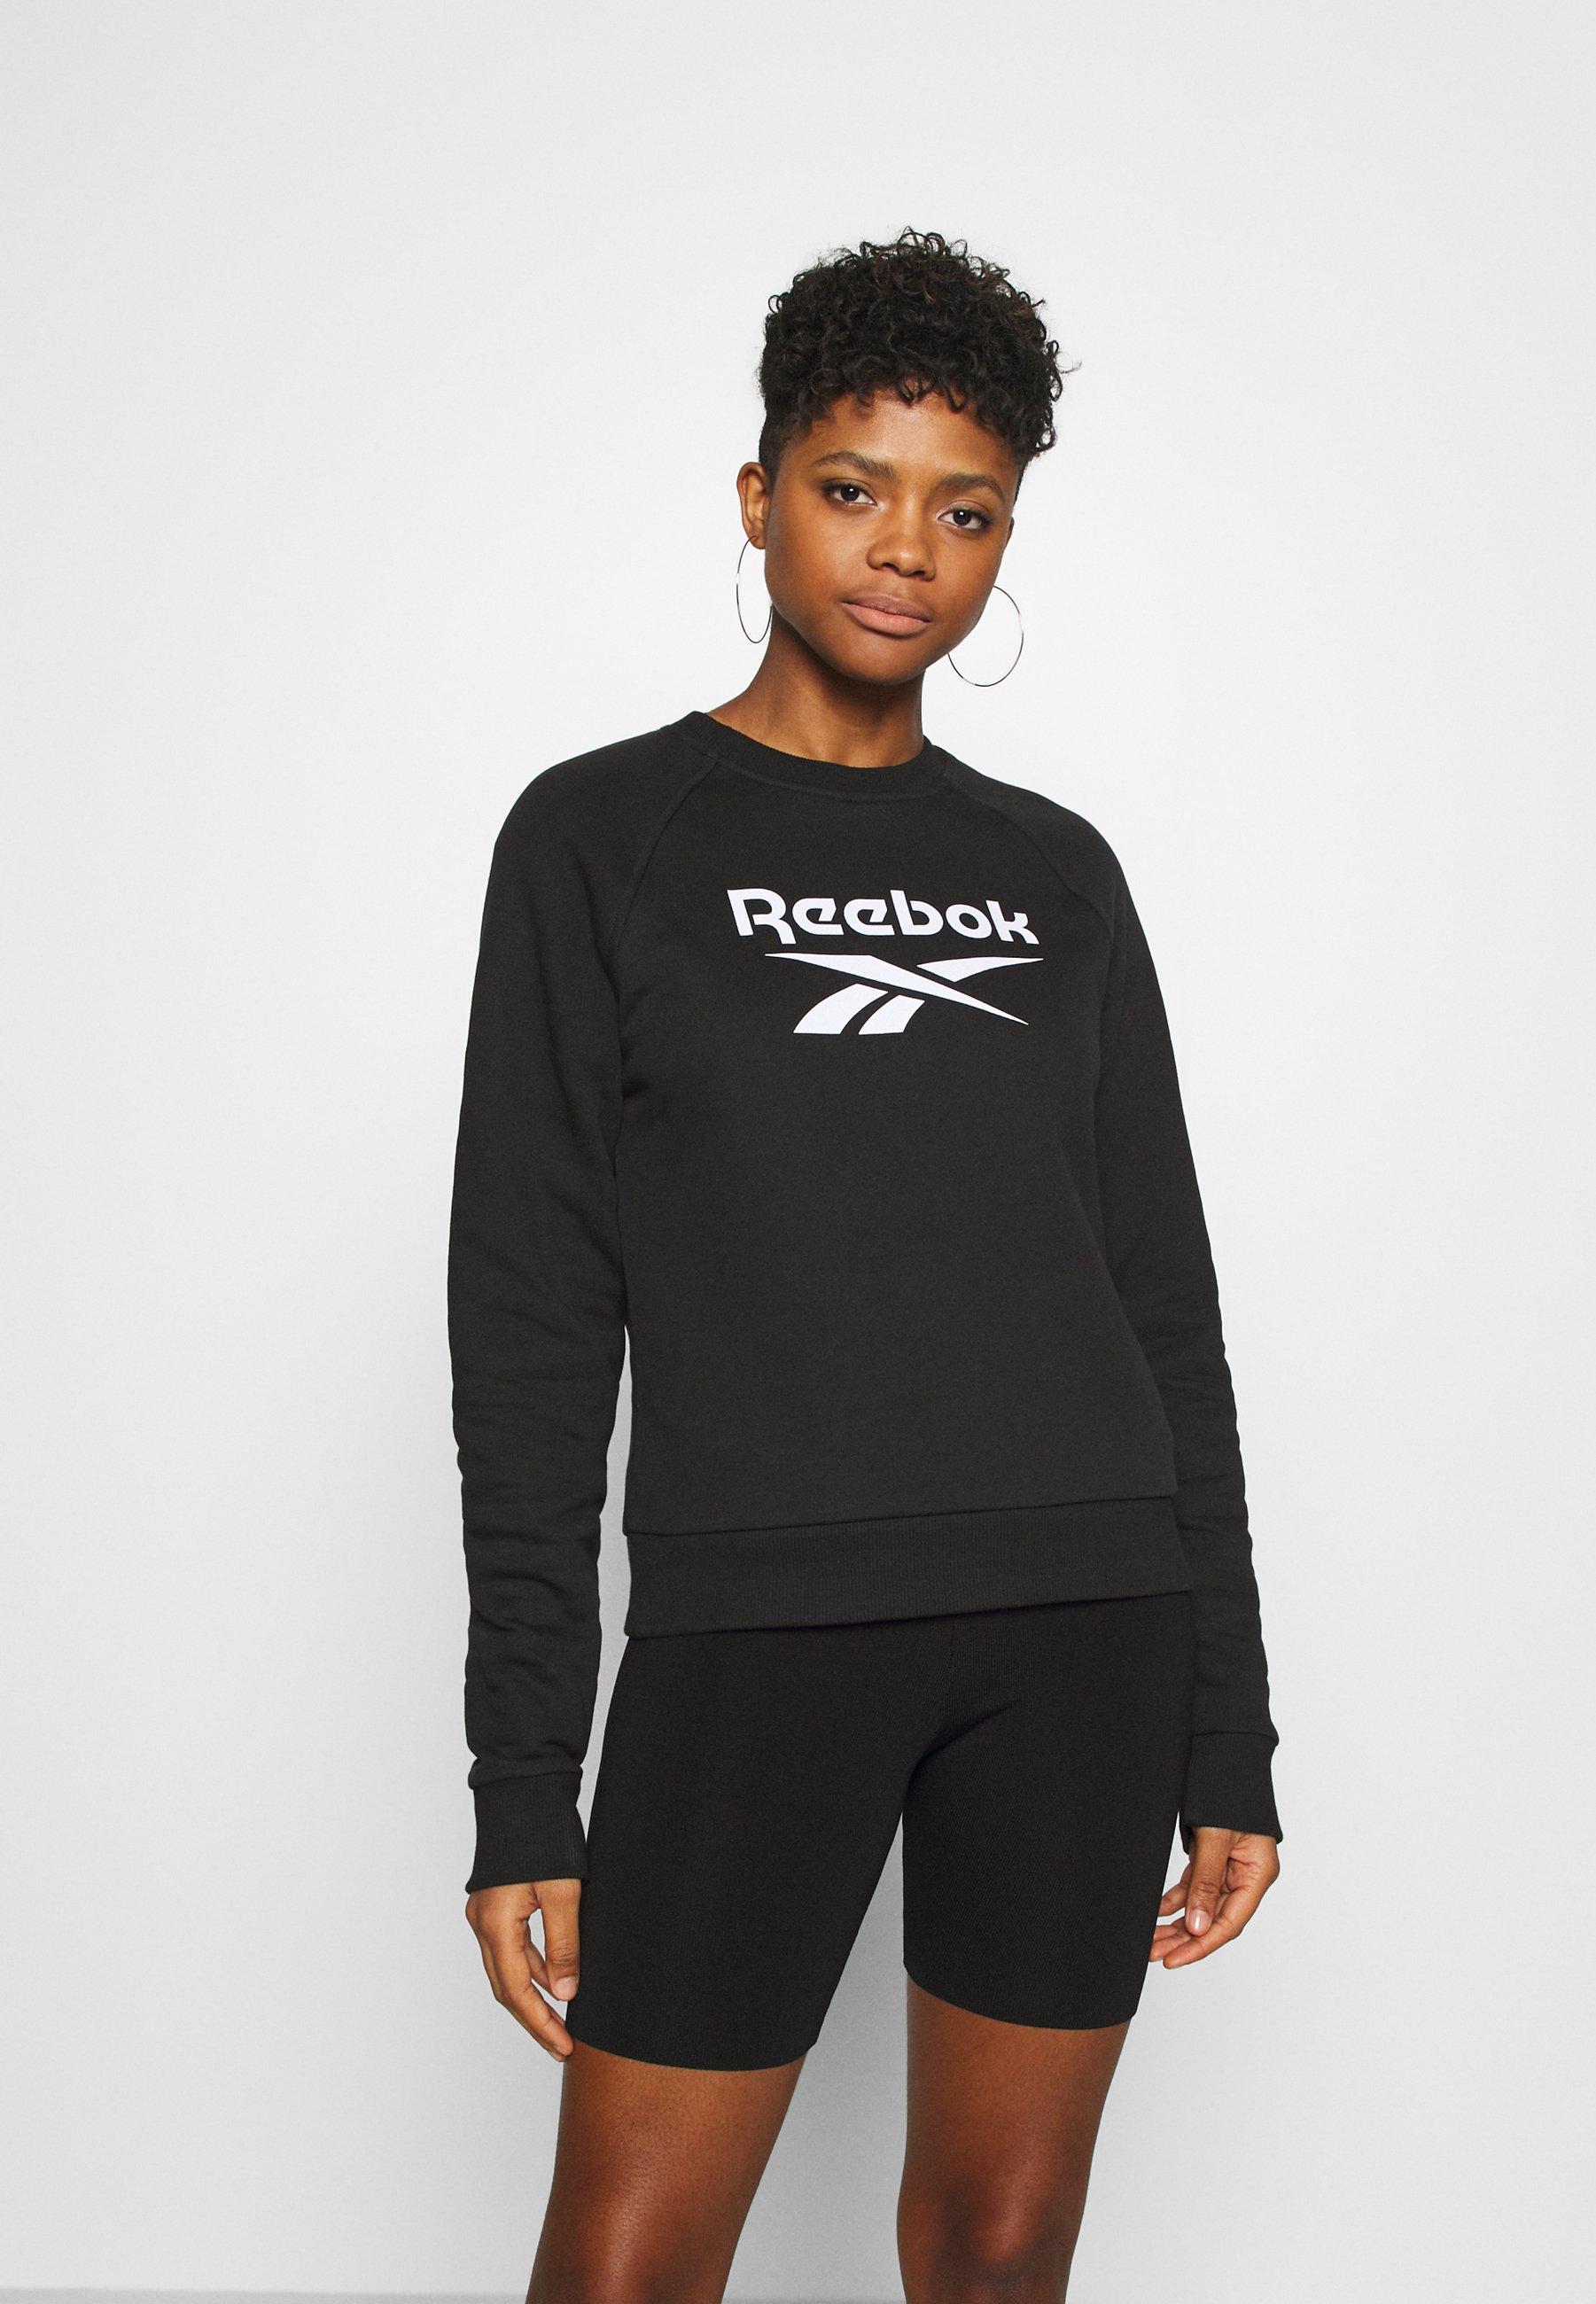 Reebok Classic Sweatshirt - black